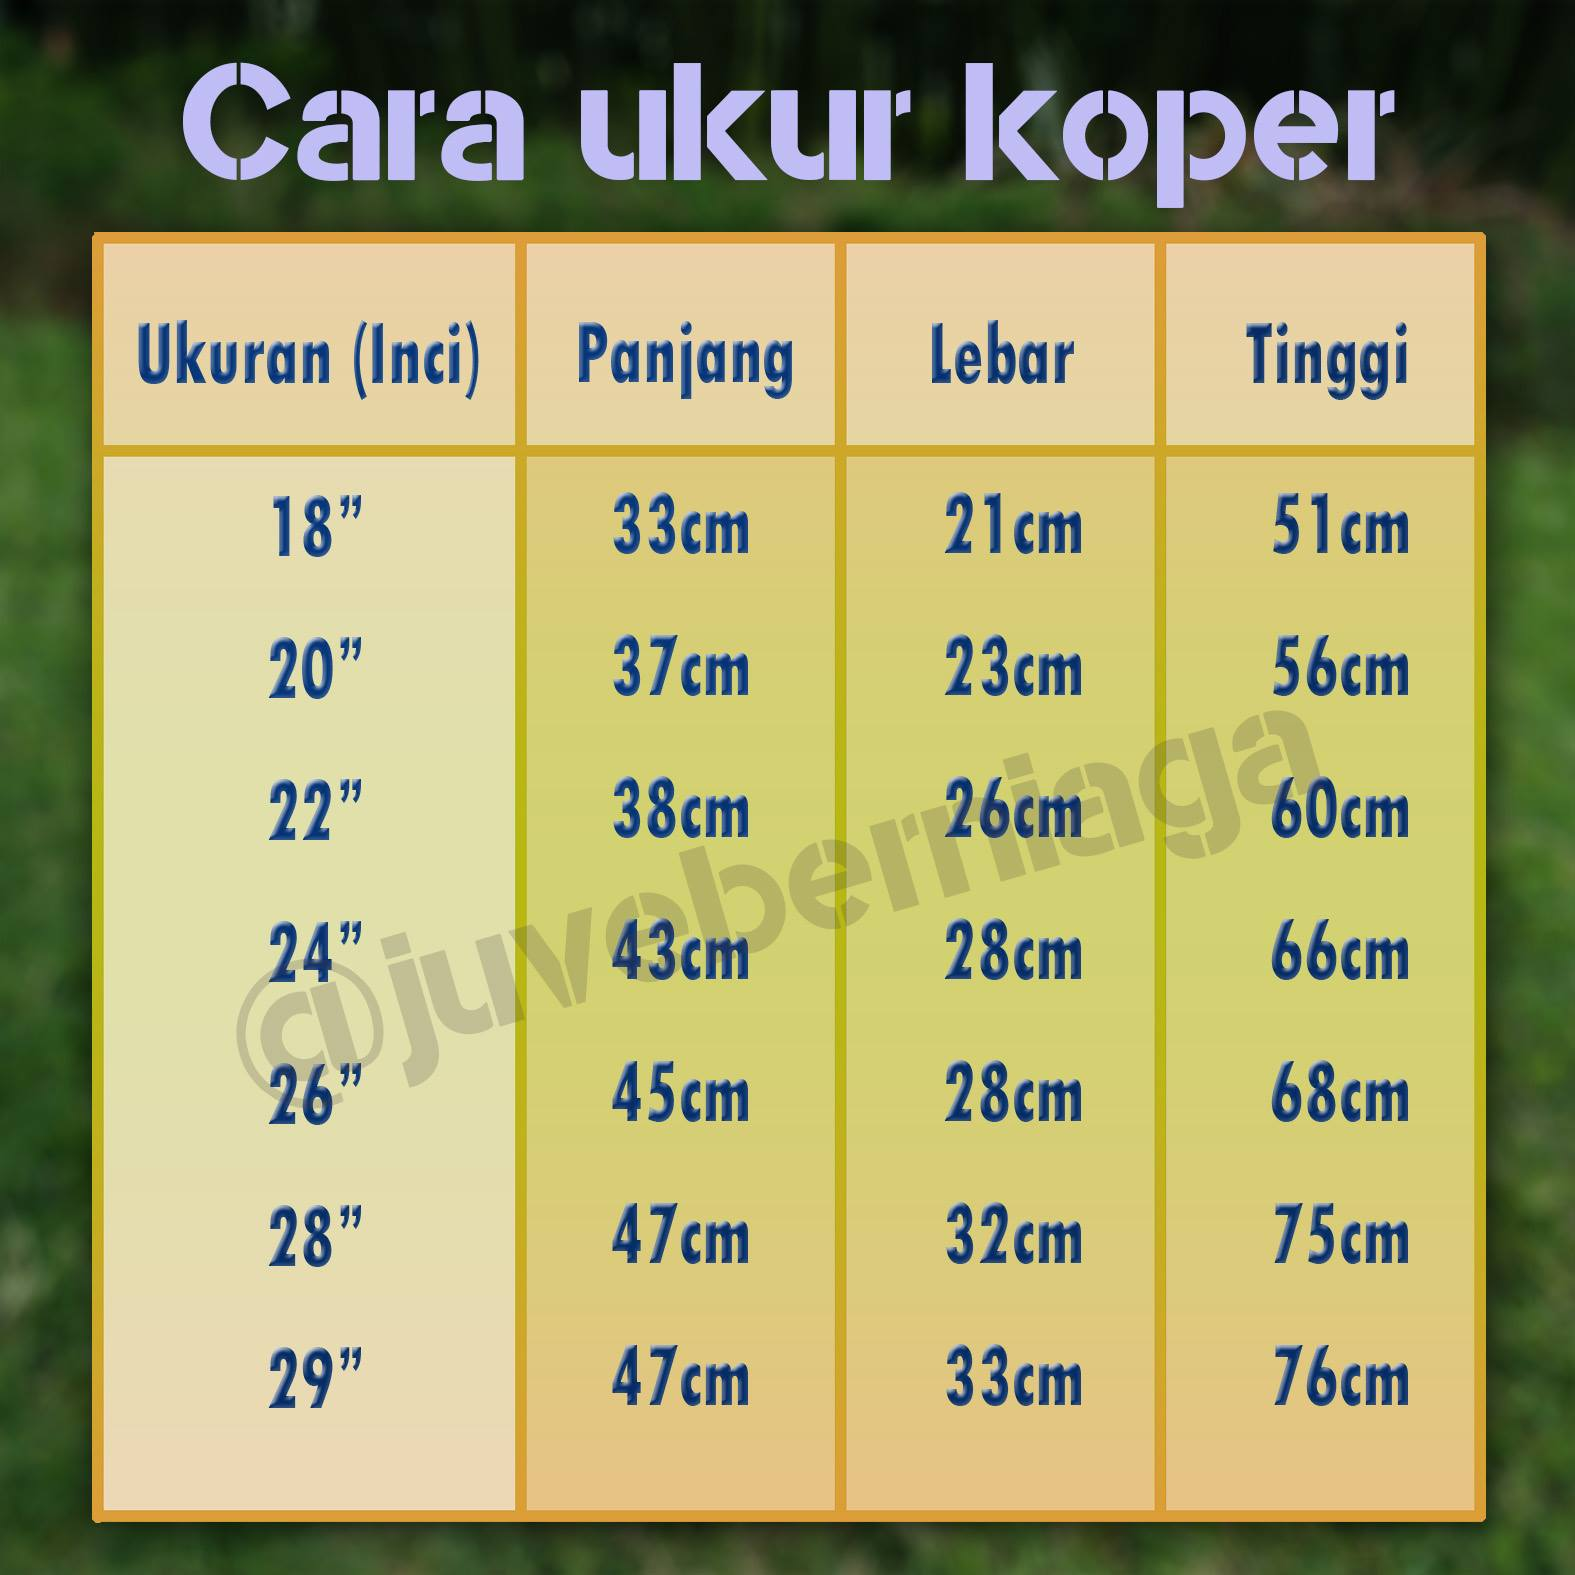 Cara Ukur Koper